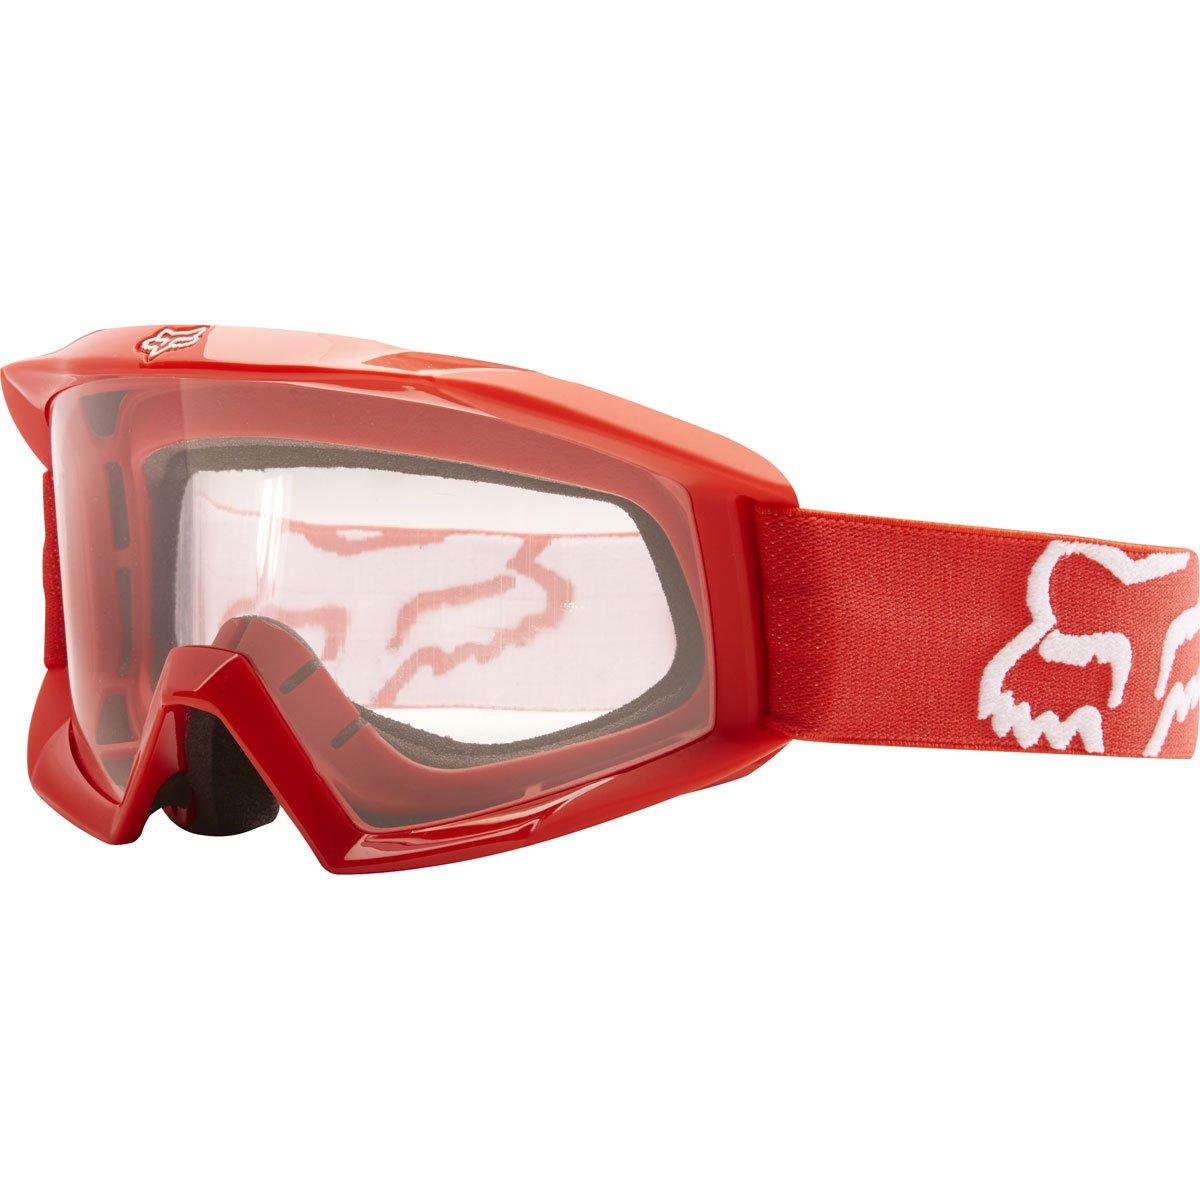 Fox Racing Main Youth Moto Motorcycle Goggles Eyewear - Red/No Size